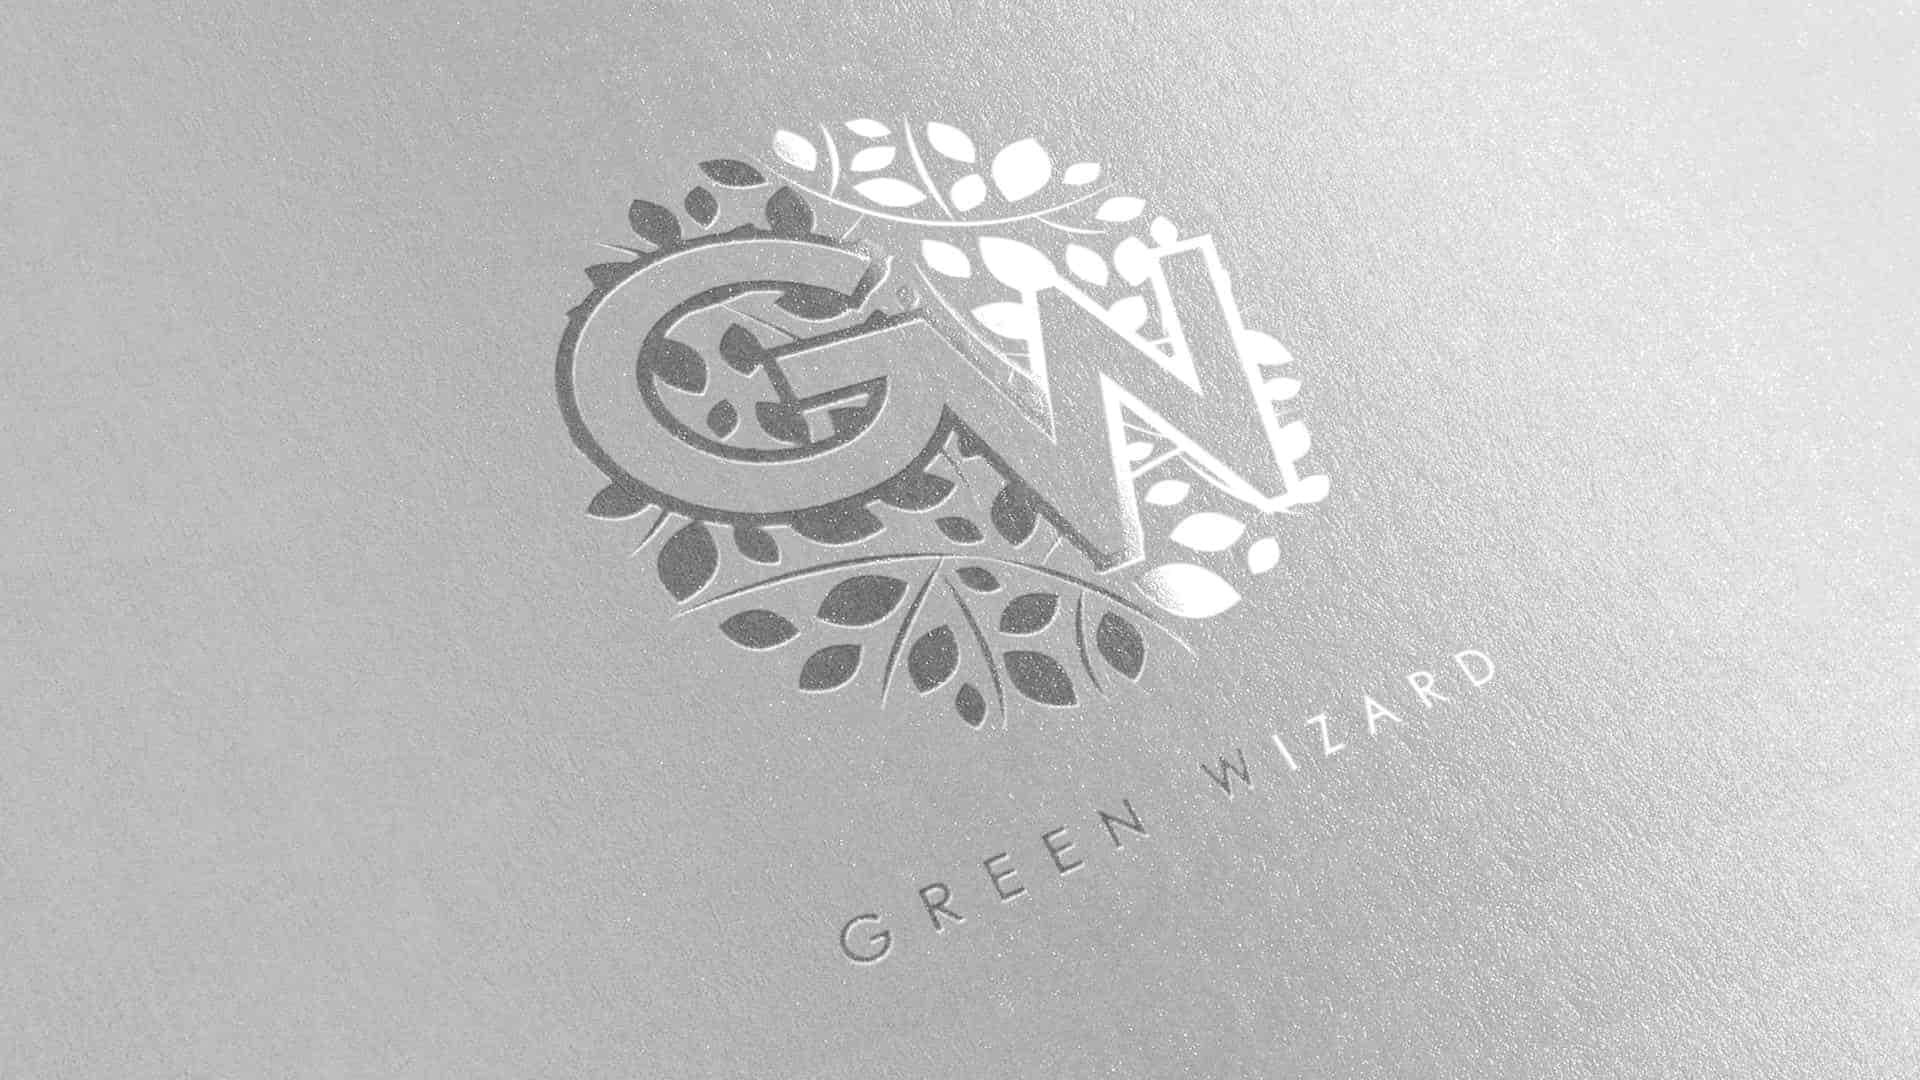 Green Wizard - створення логотипу